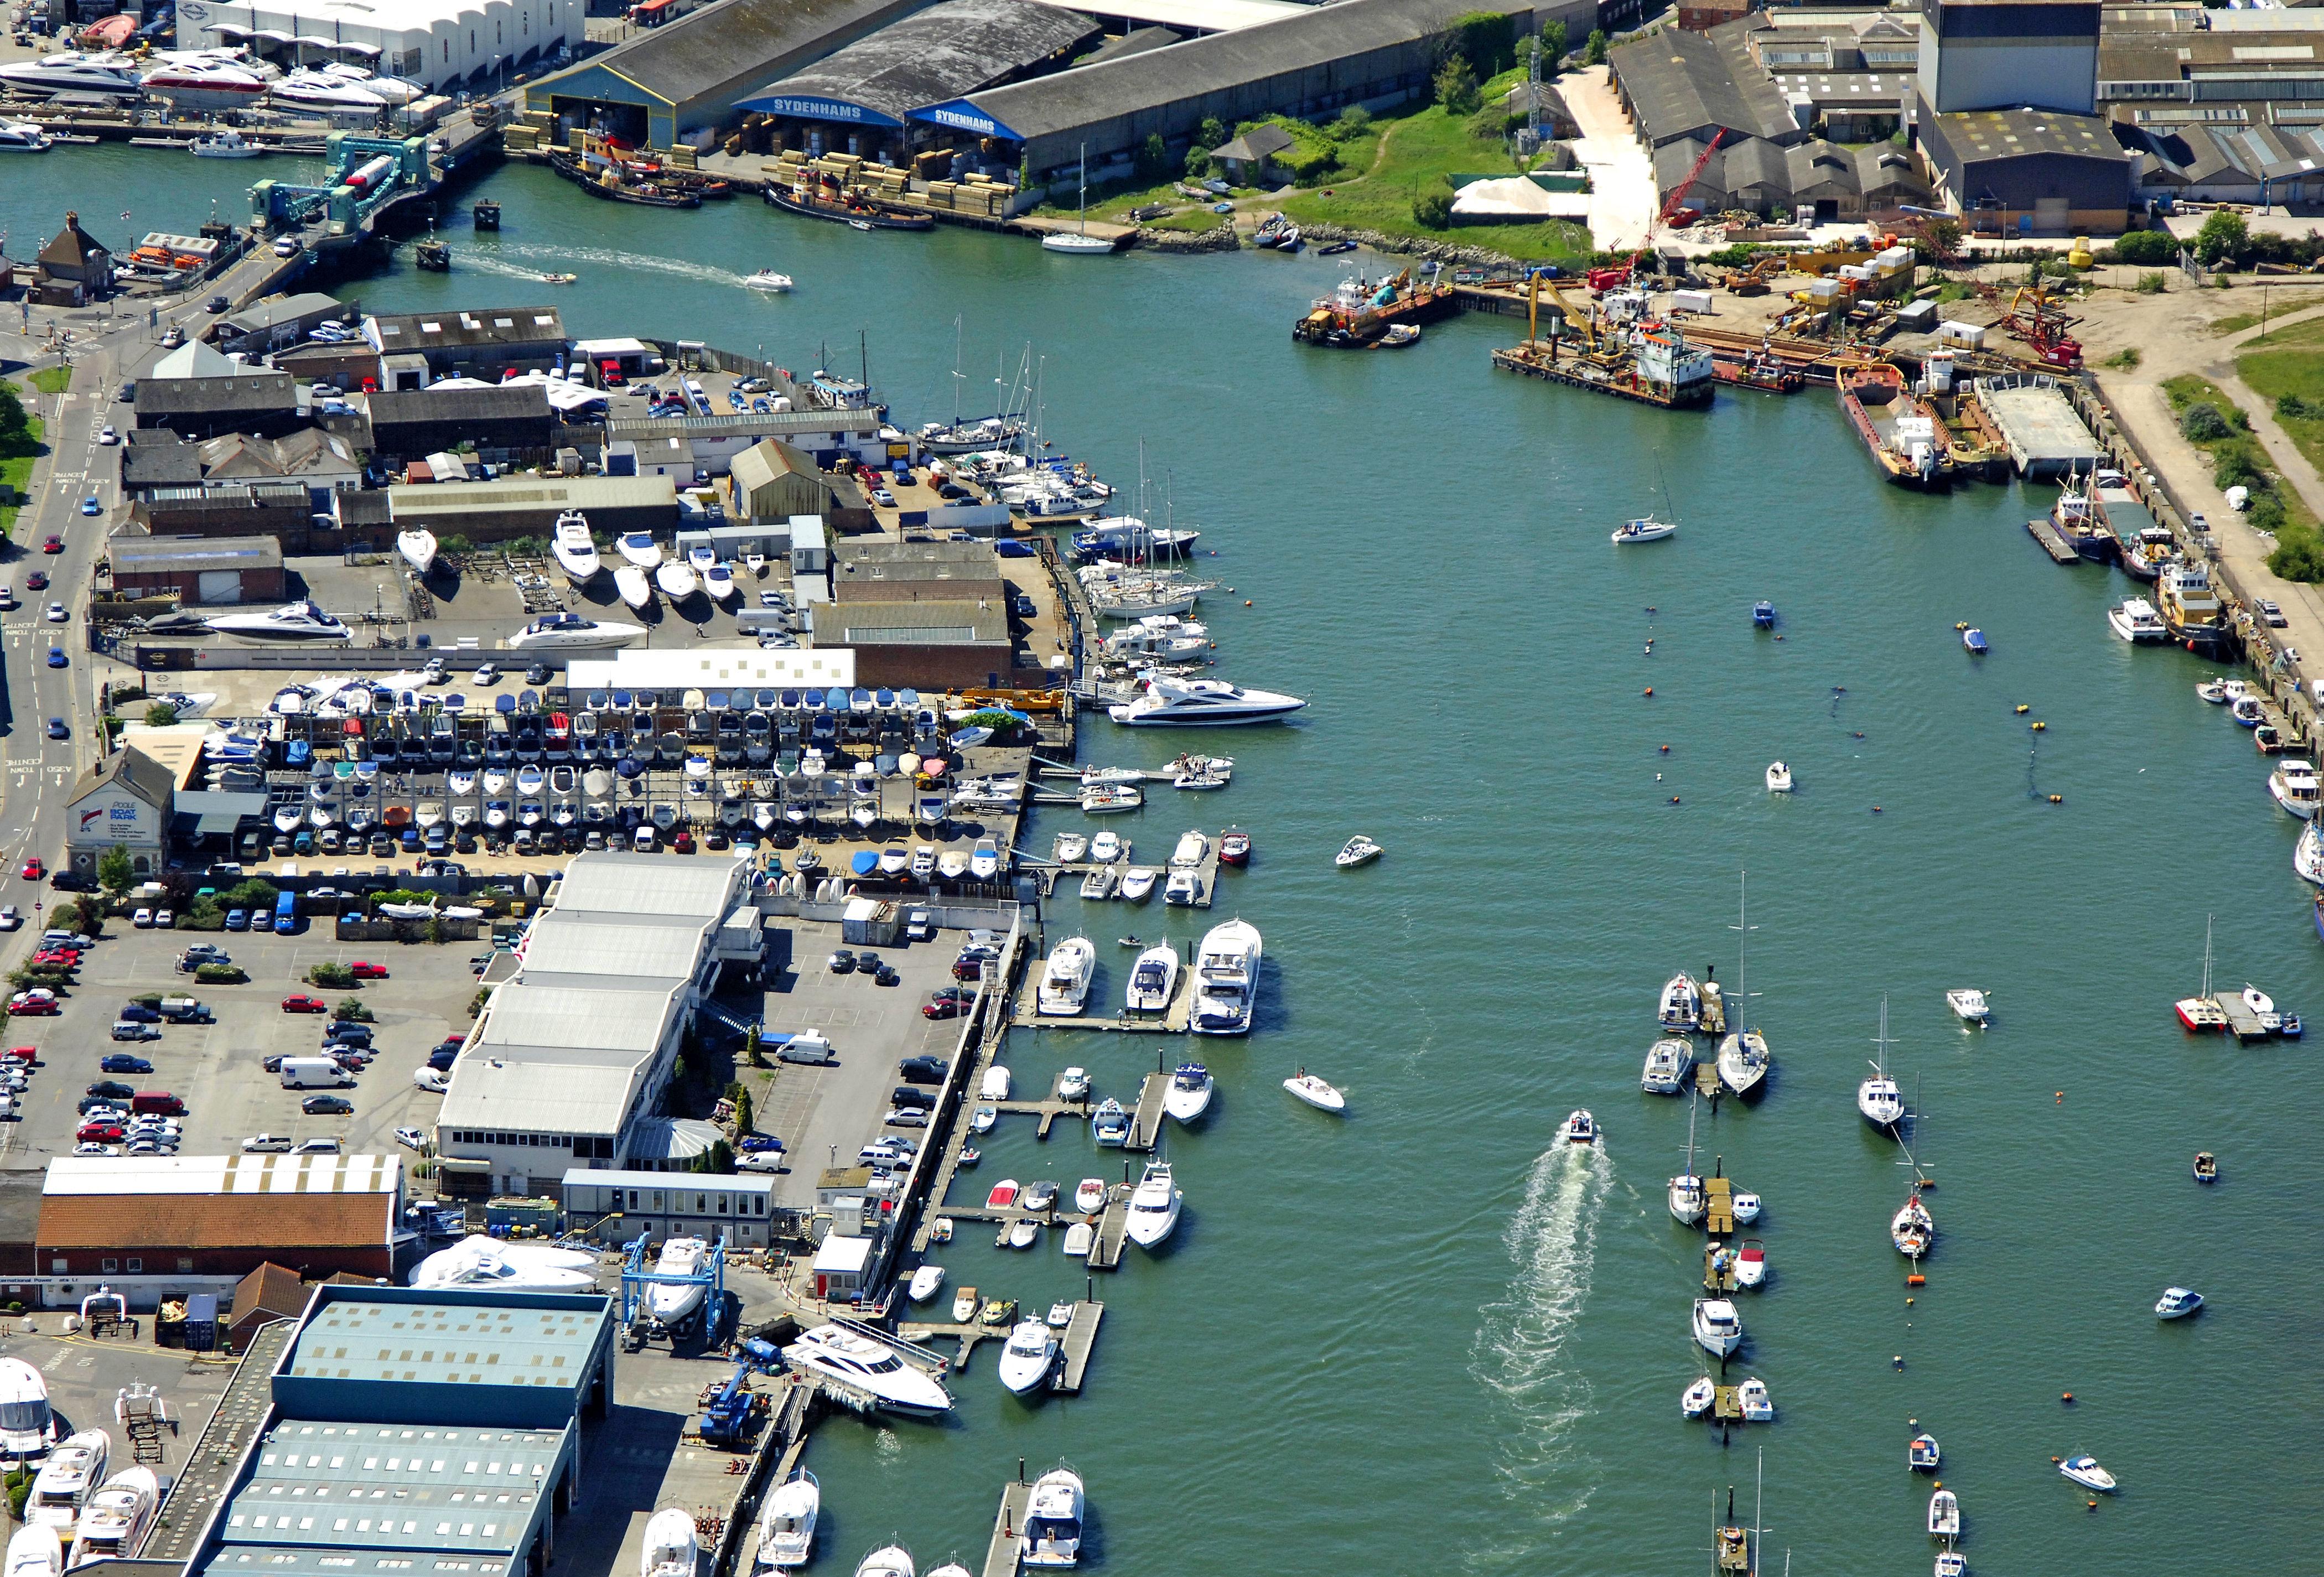 Poole Boat Park in Poole, Dorset, GB, United Kingdom